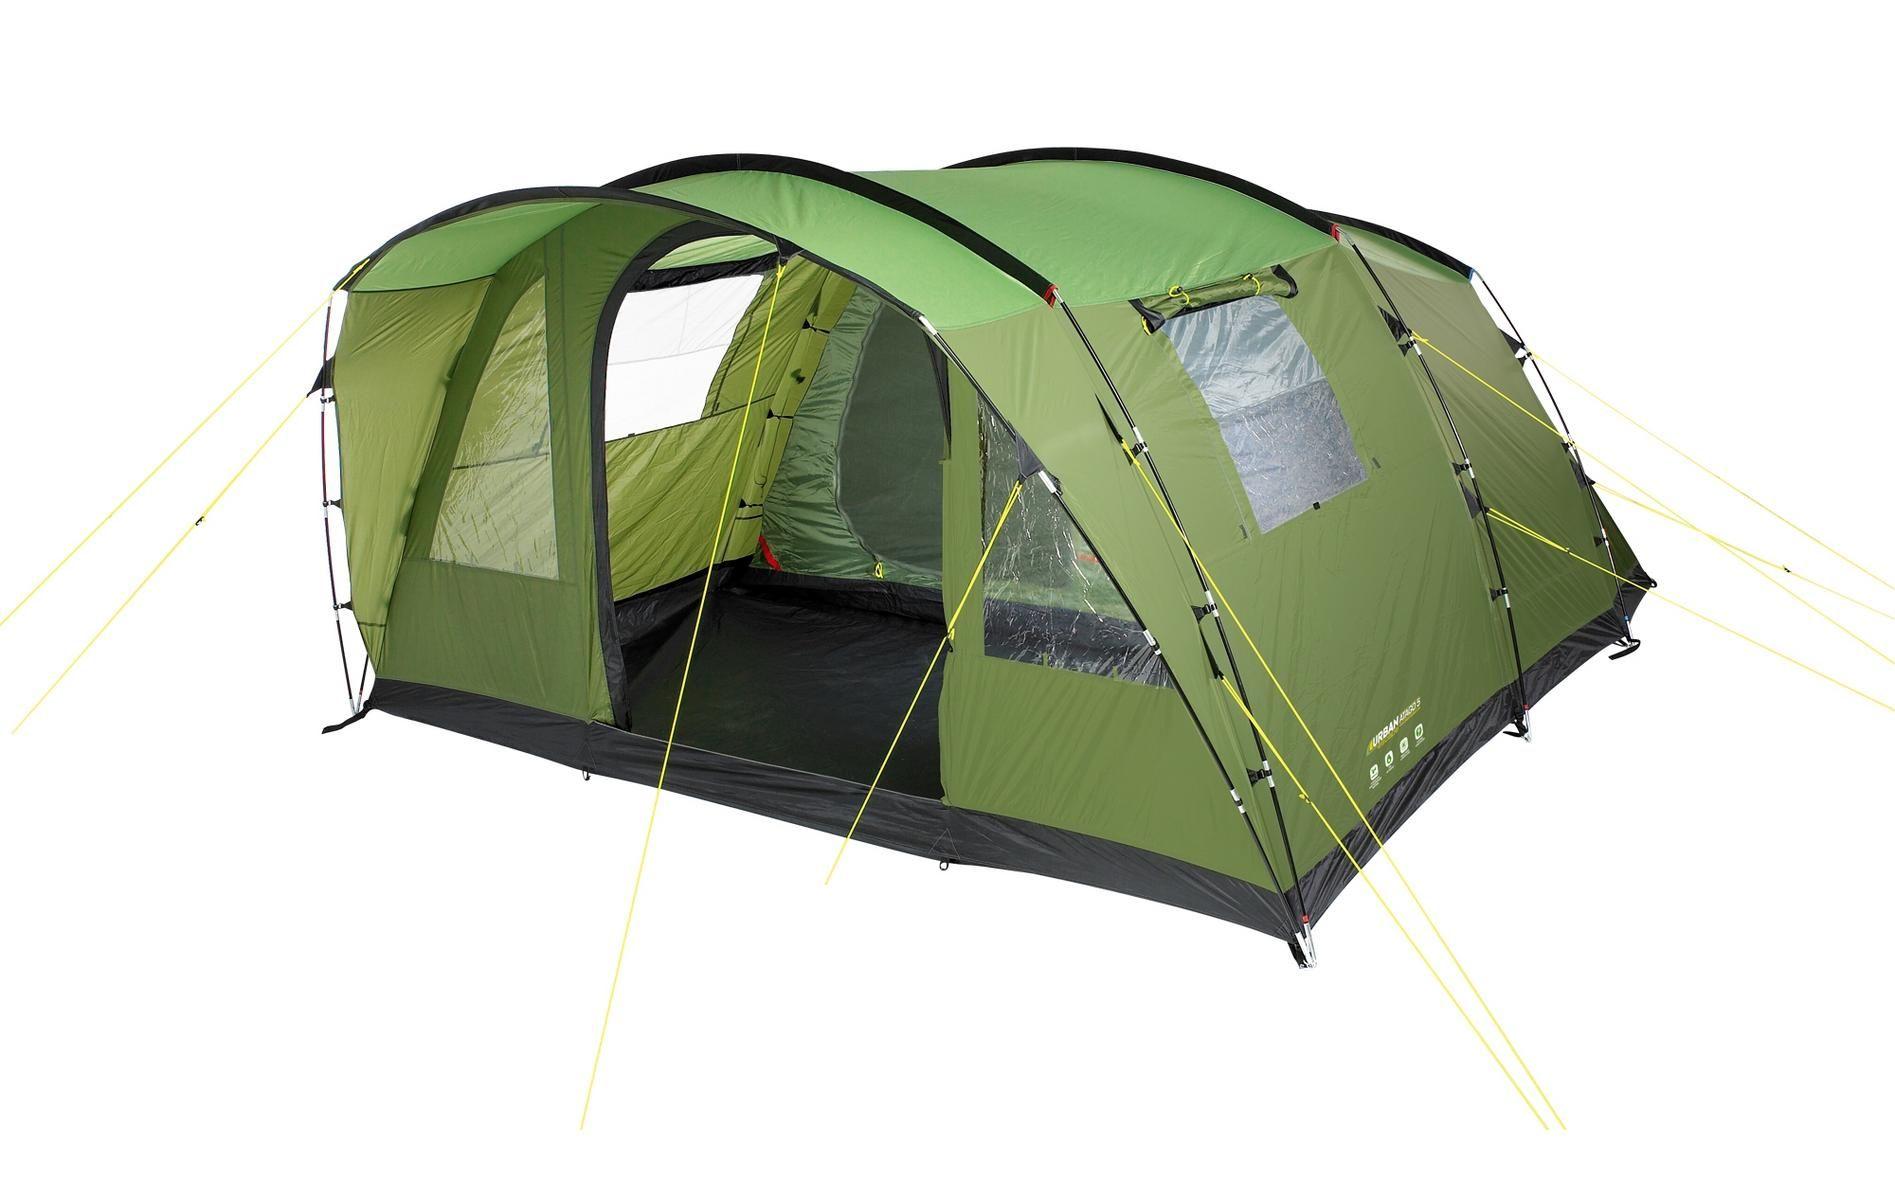 Urban Escape Atago 5 Man Tent  sc 1 st  Pinterest & Urban Escape Atago 5 Man Tent | camping | Pinterest | Tents and ...